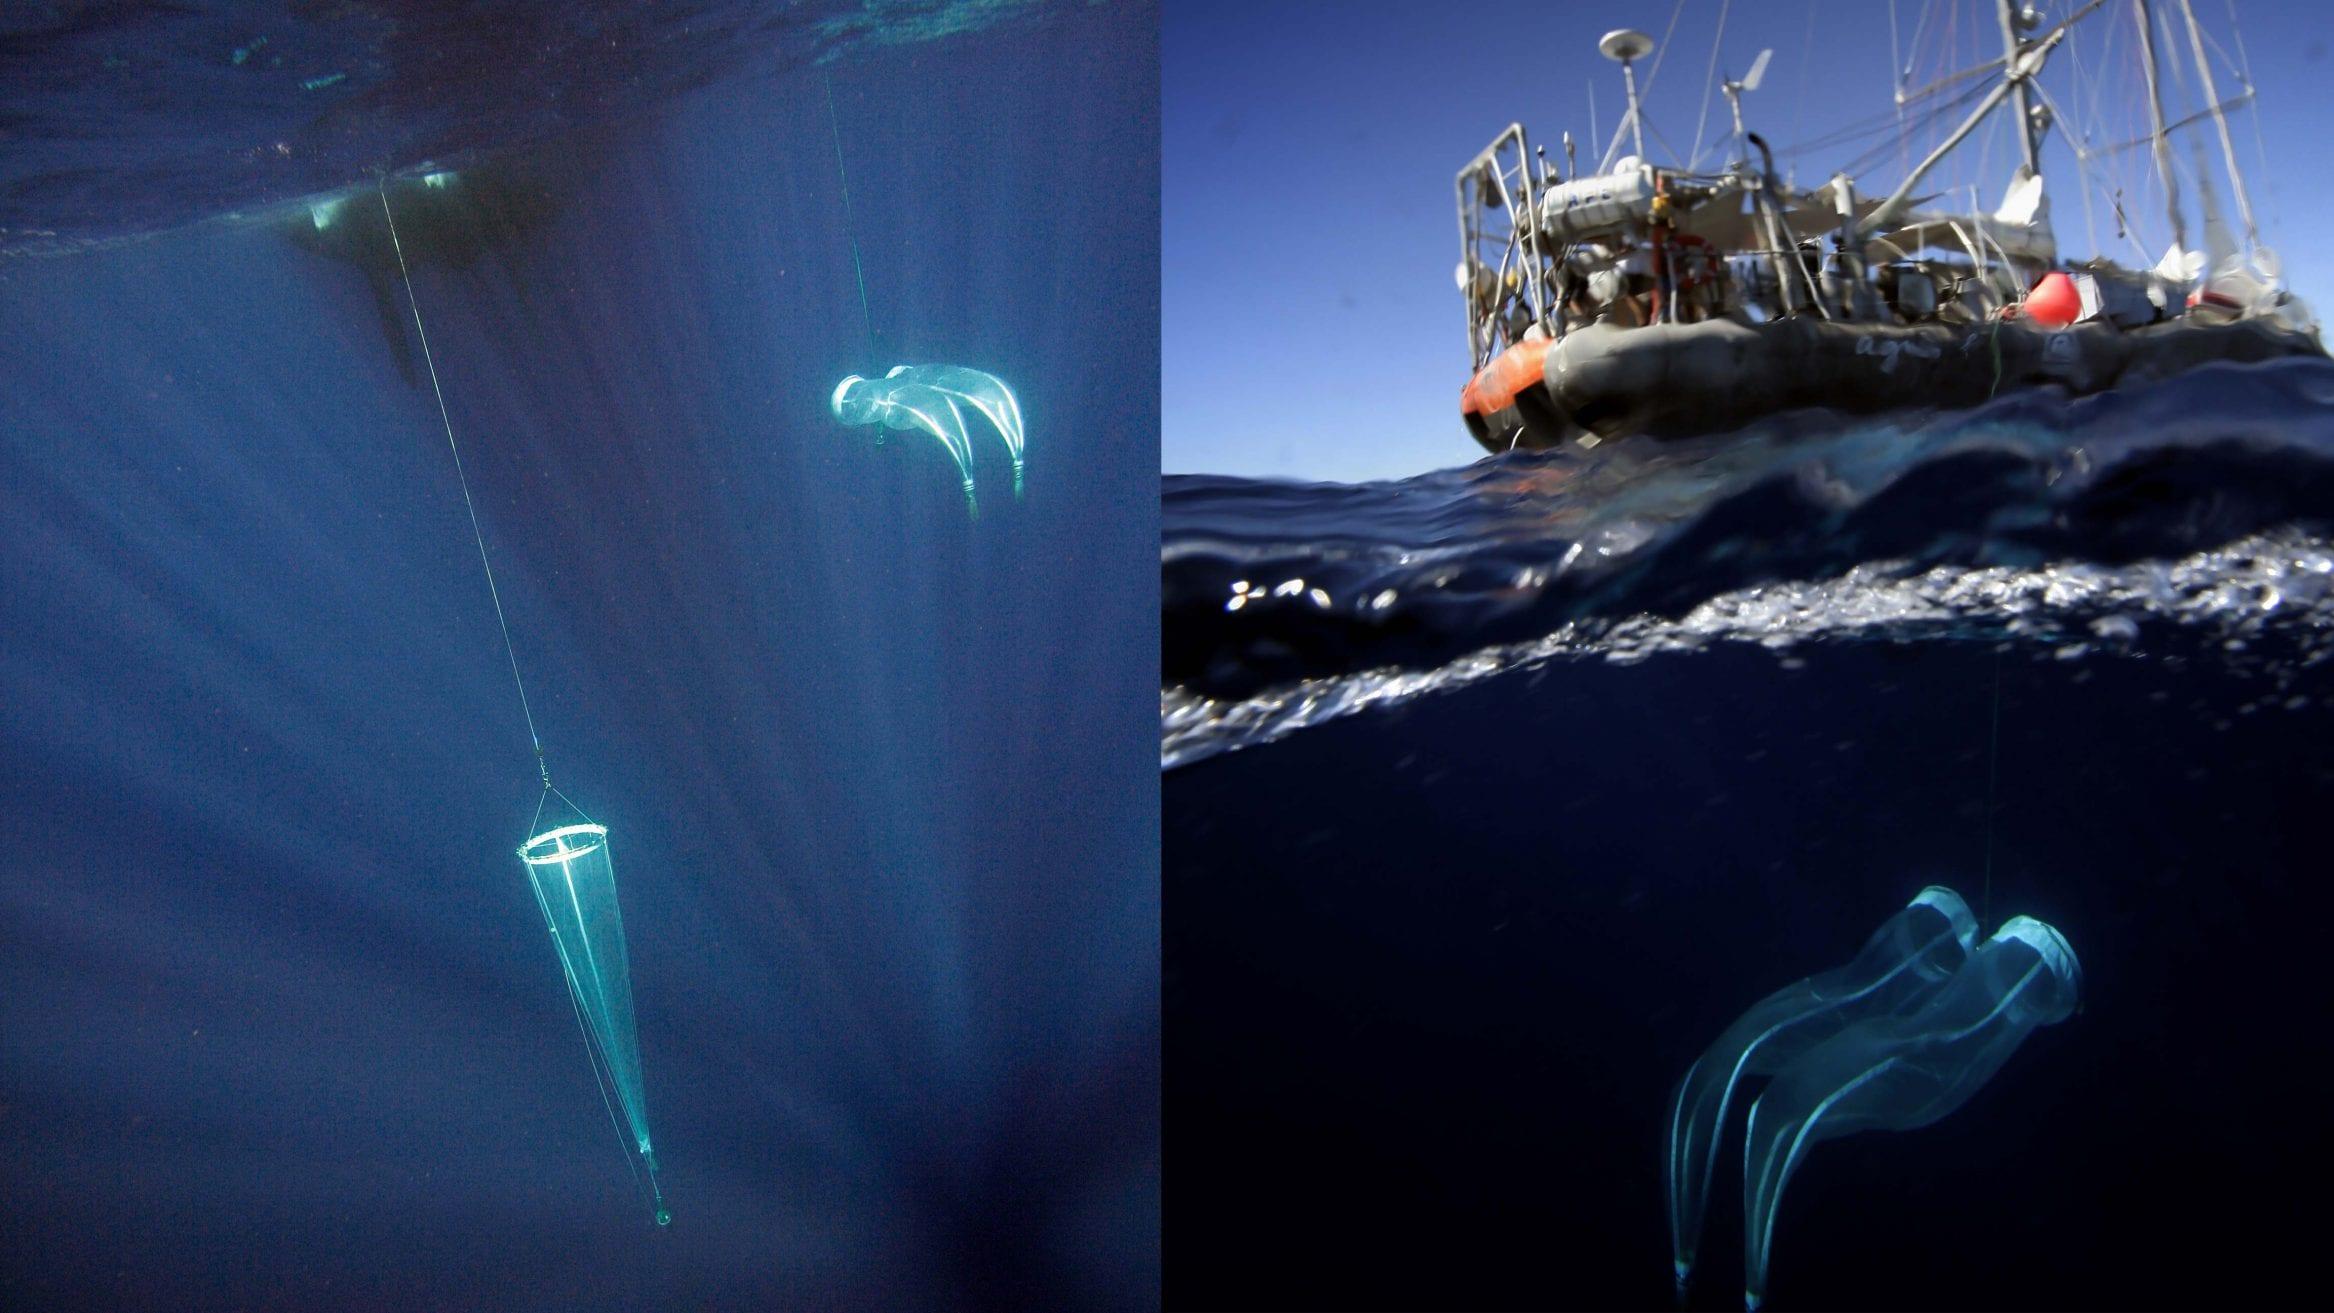 plankton species diversity climate change Tara Ocean